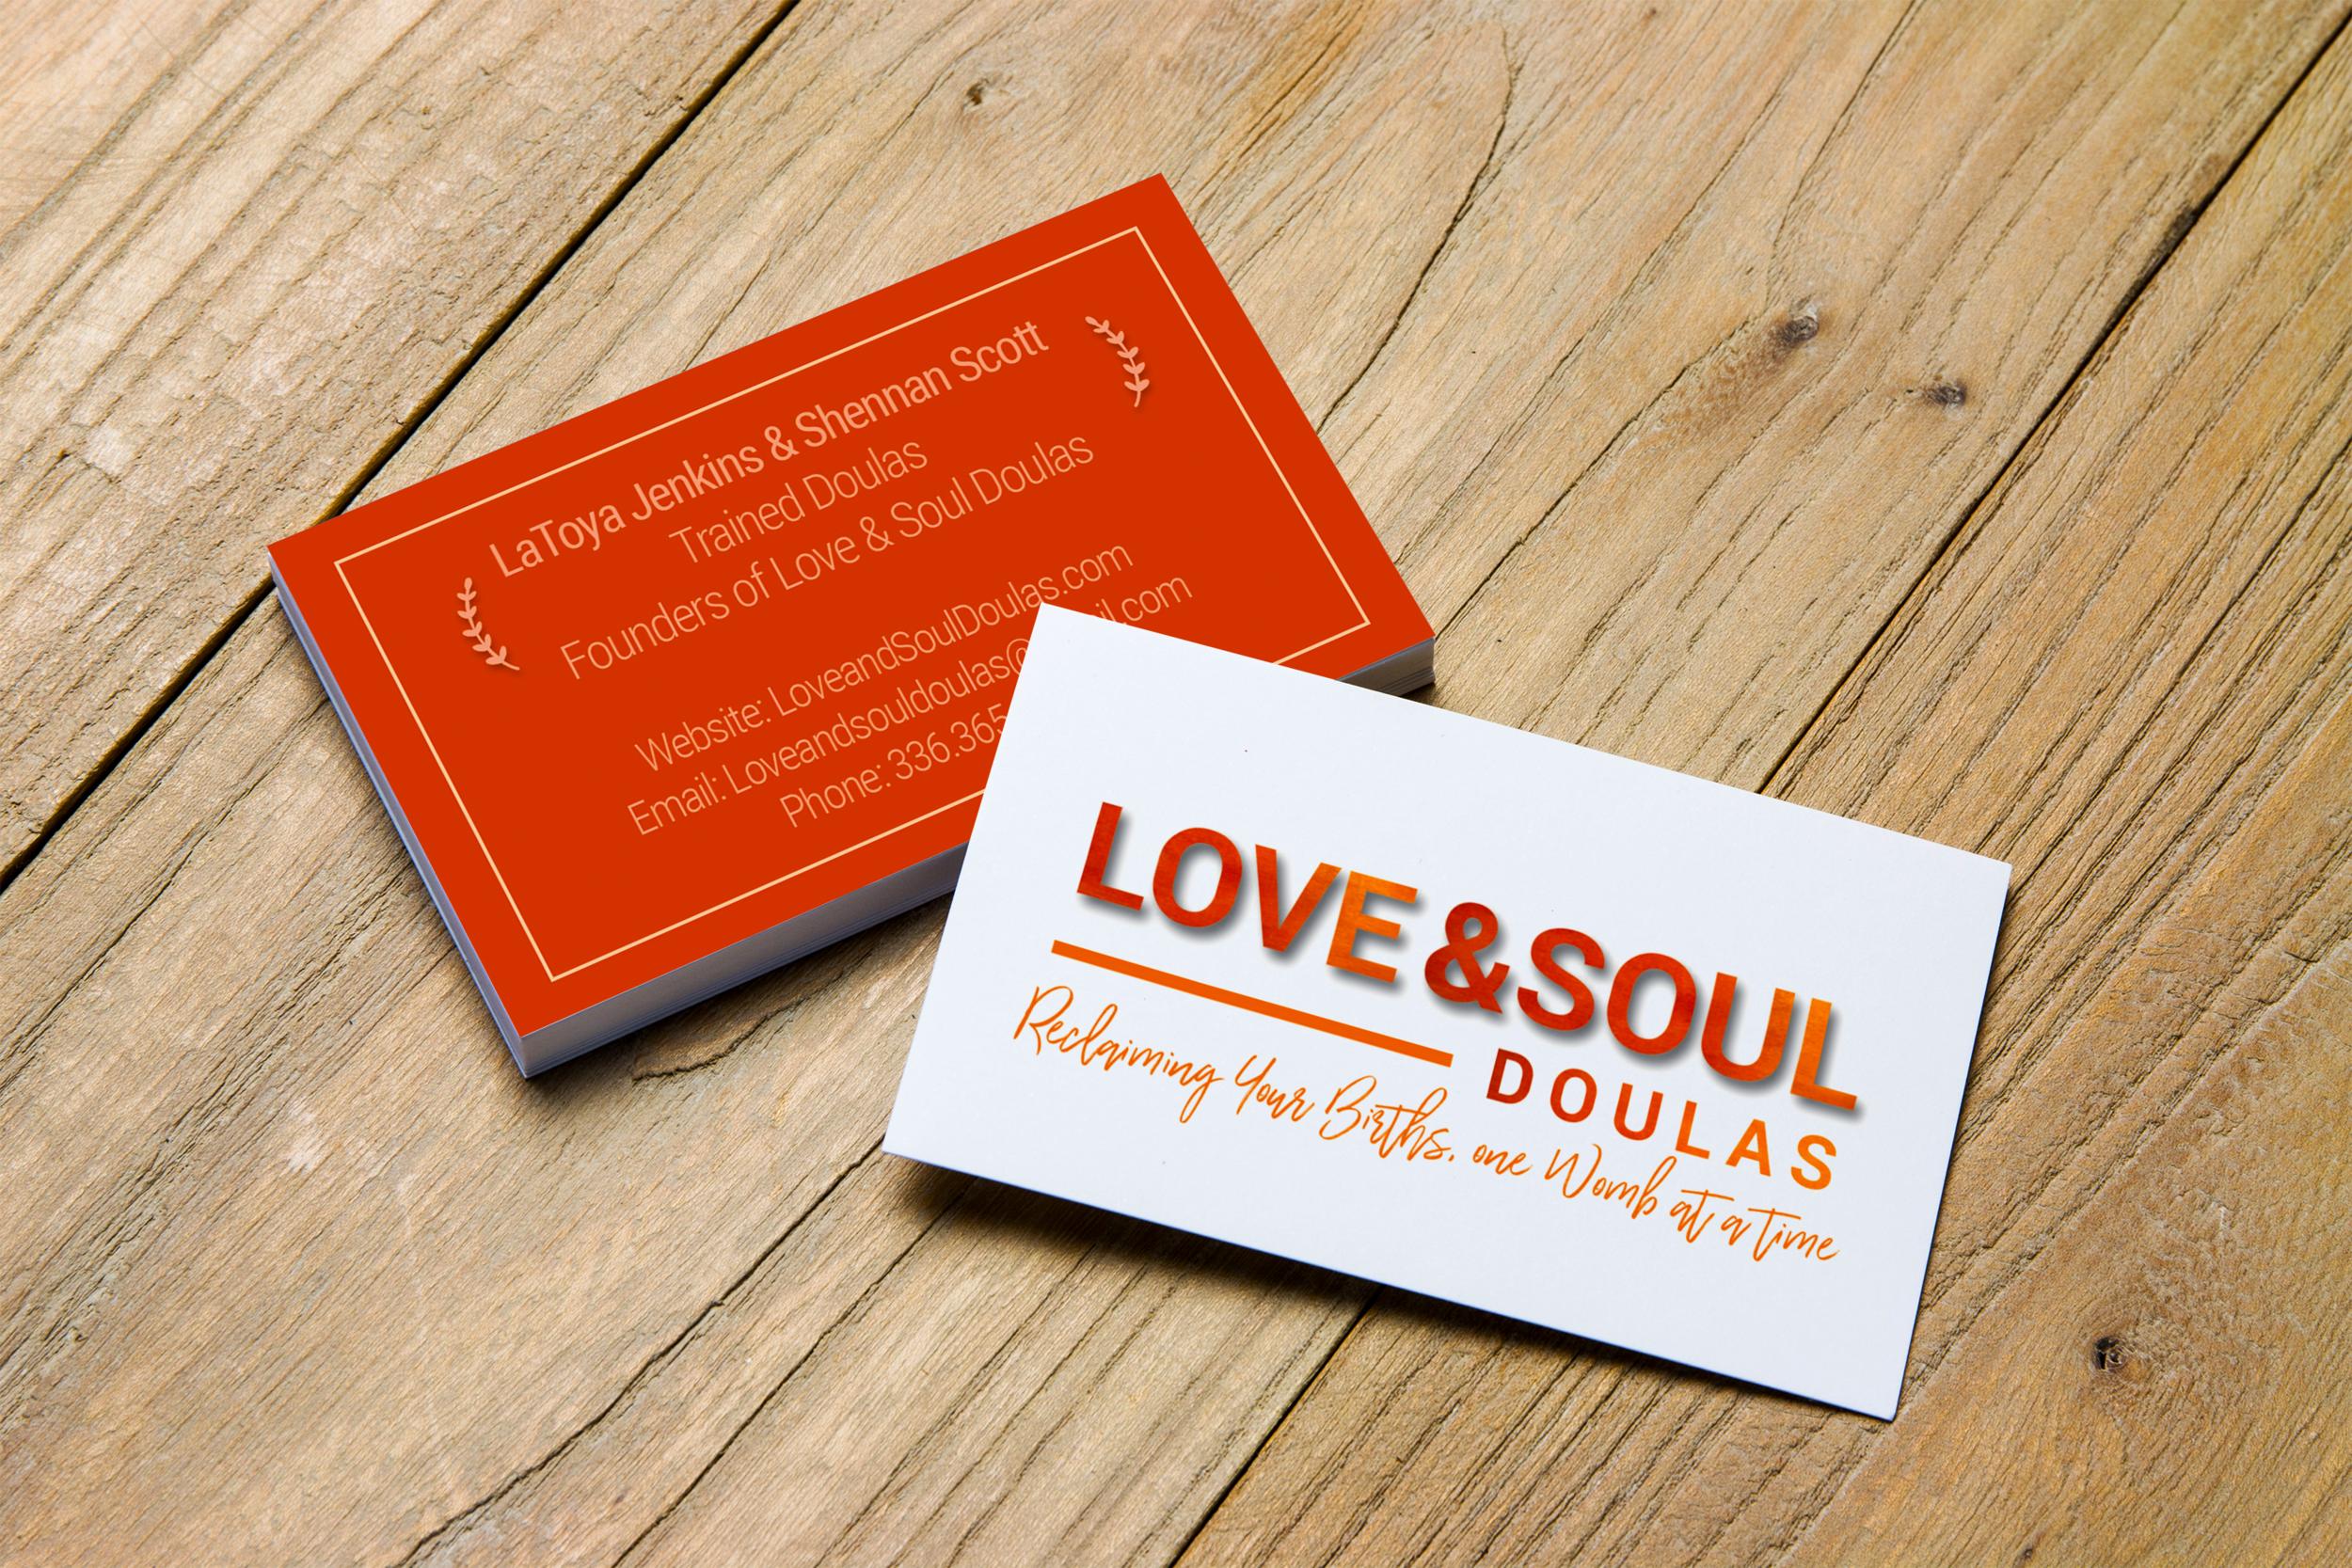 Love&Soul.png